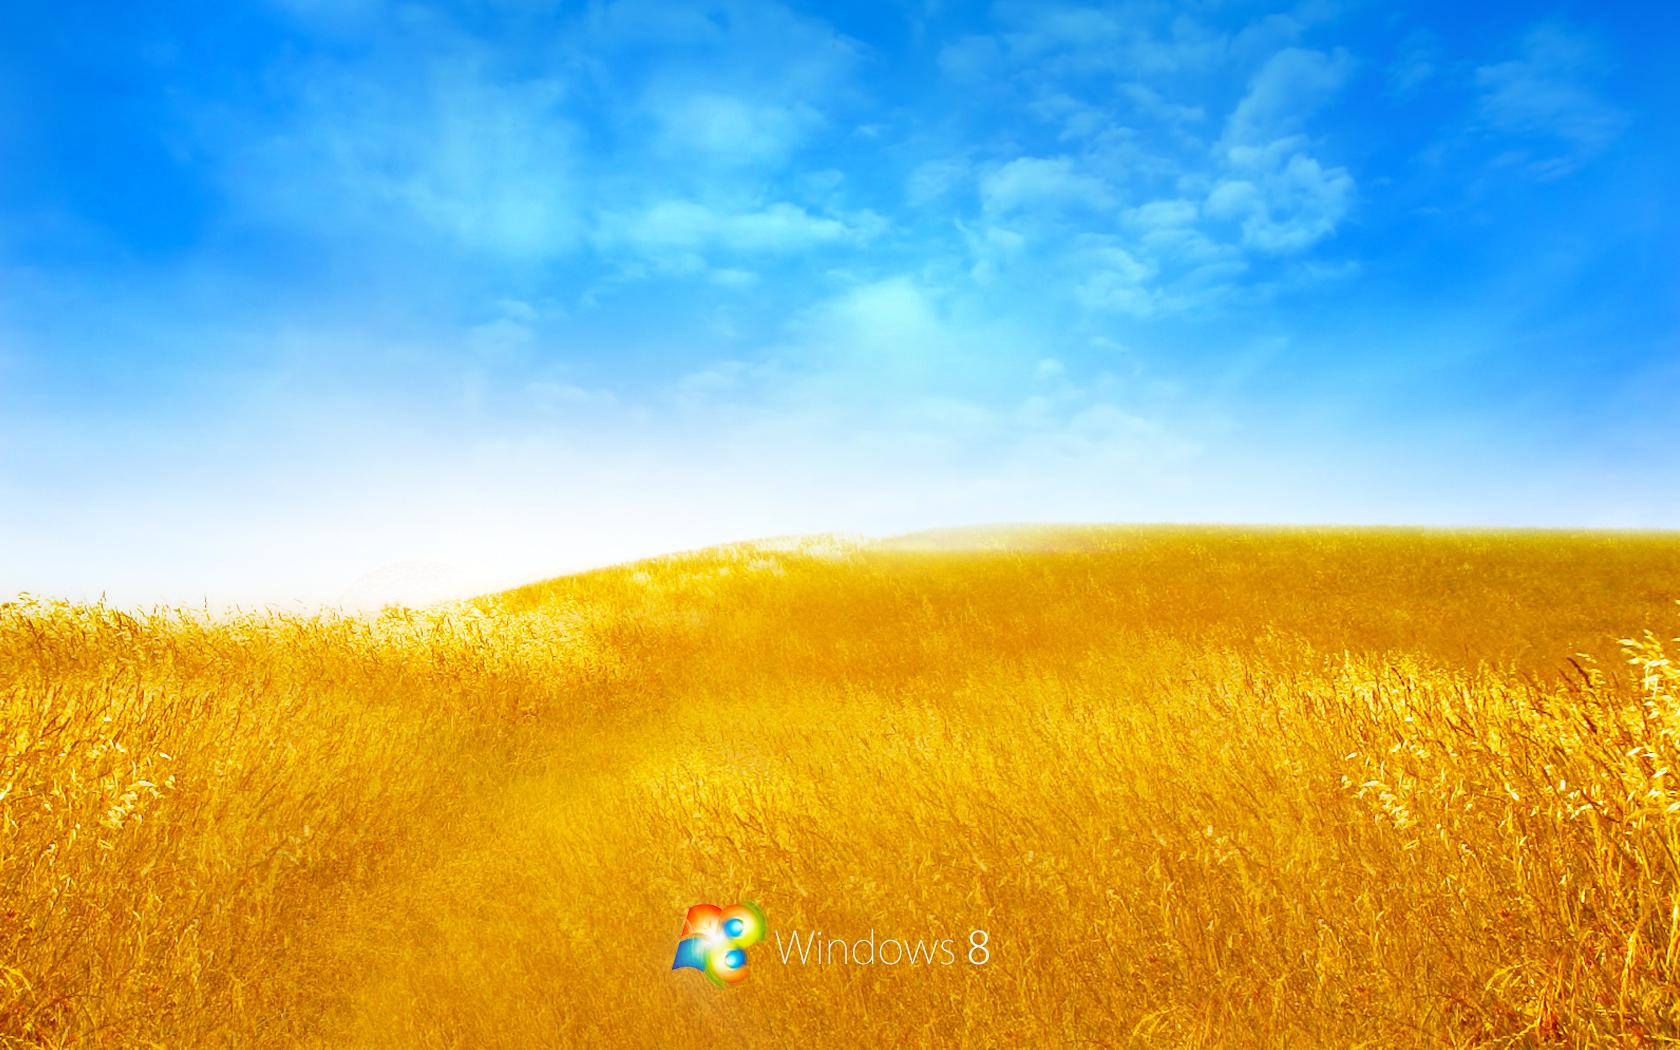 48+ 4K Live Wallpaper Windows 10 on WallpaperSafari